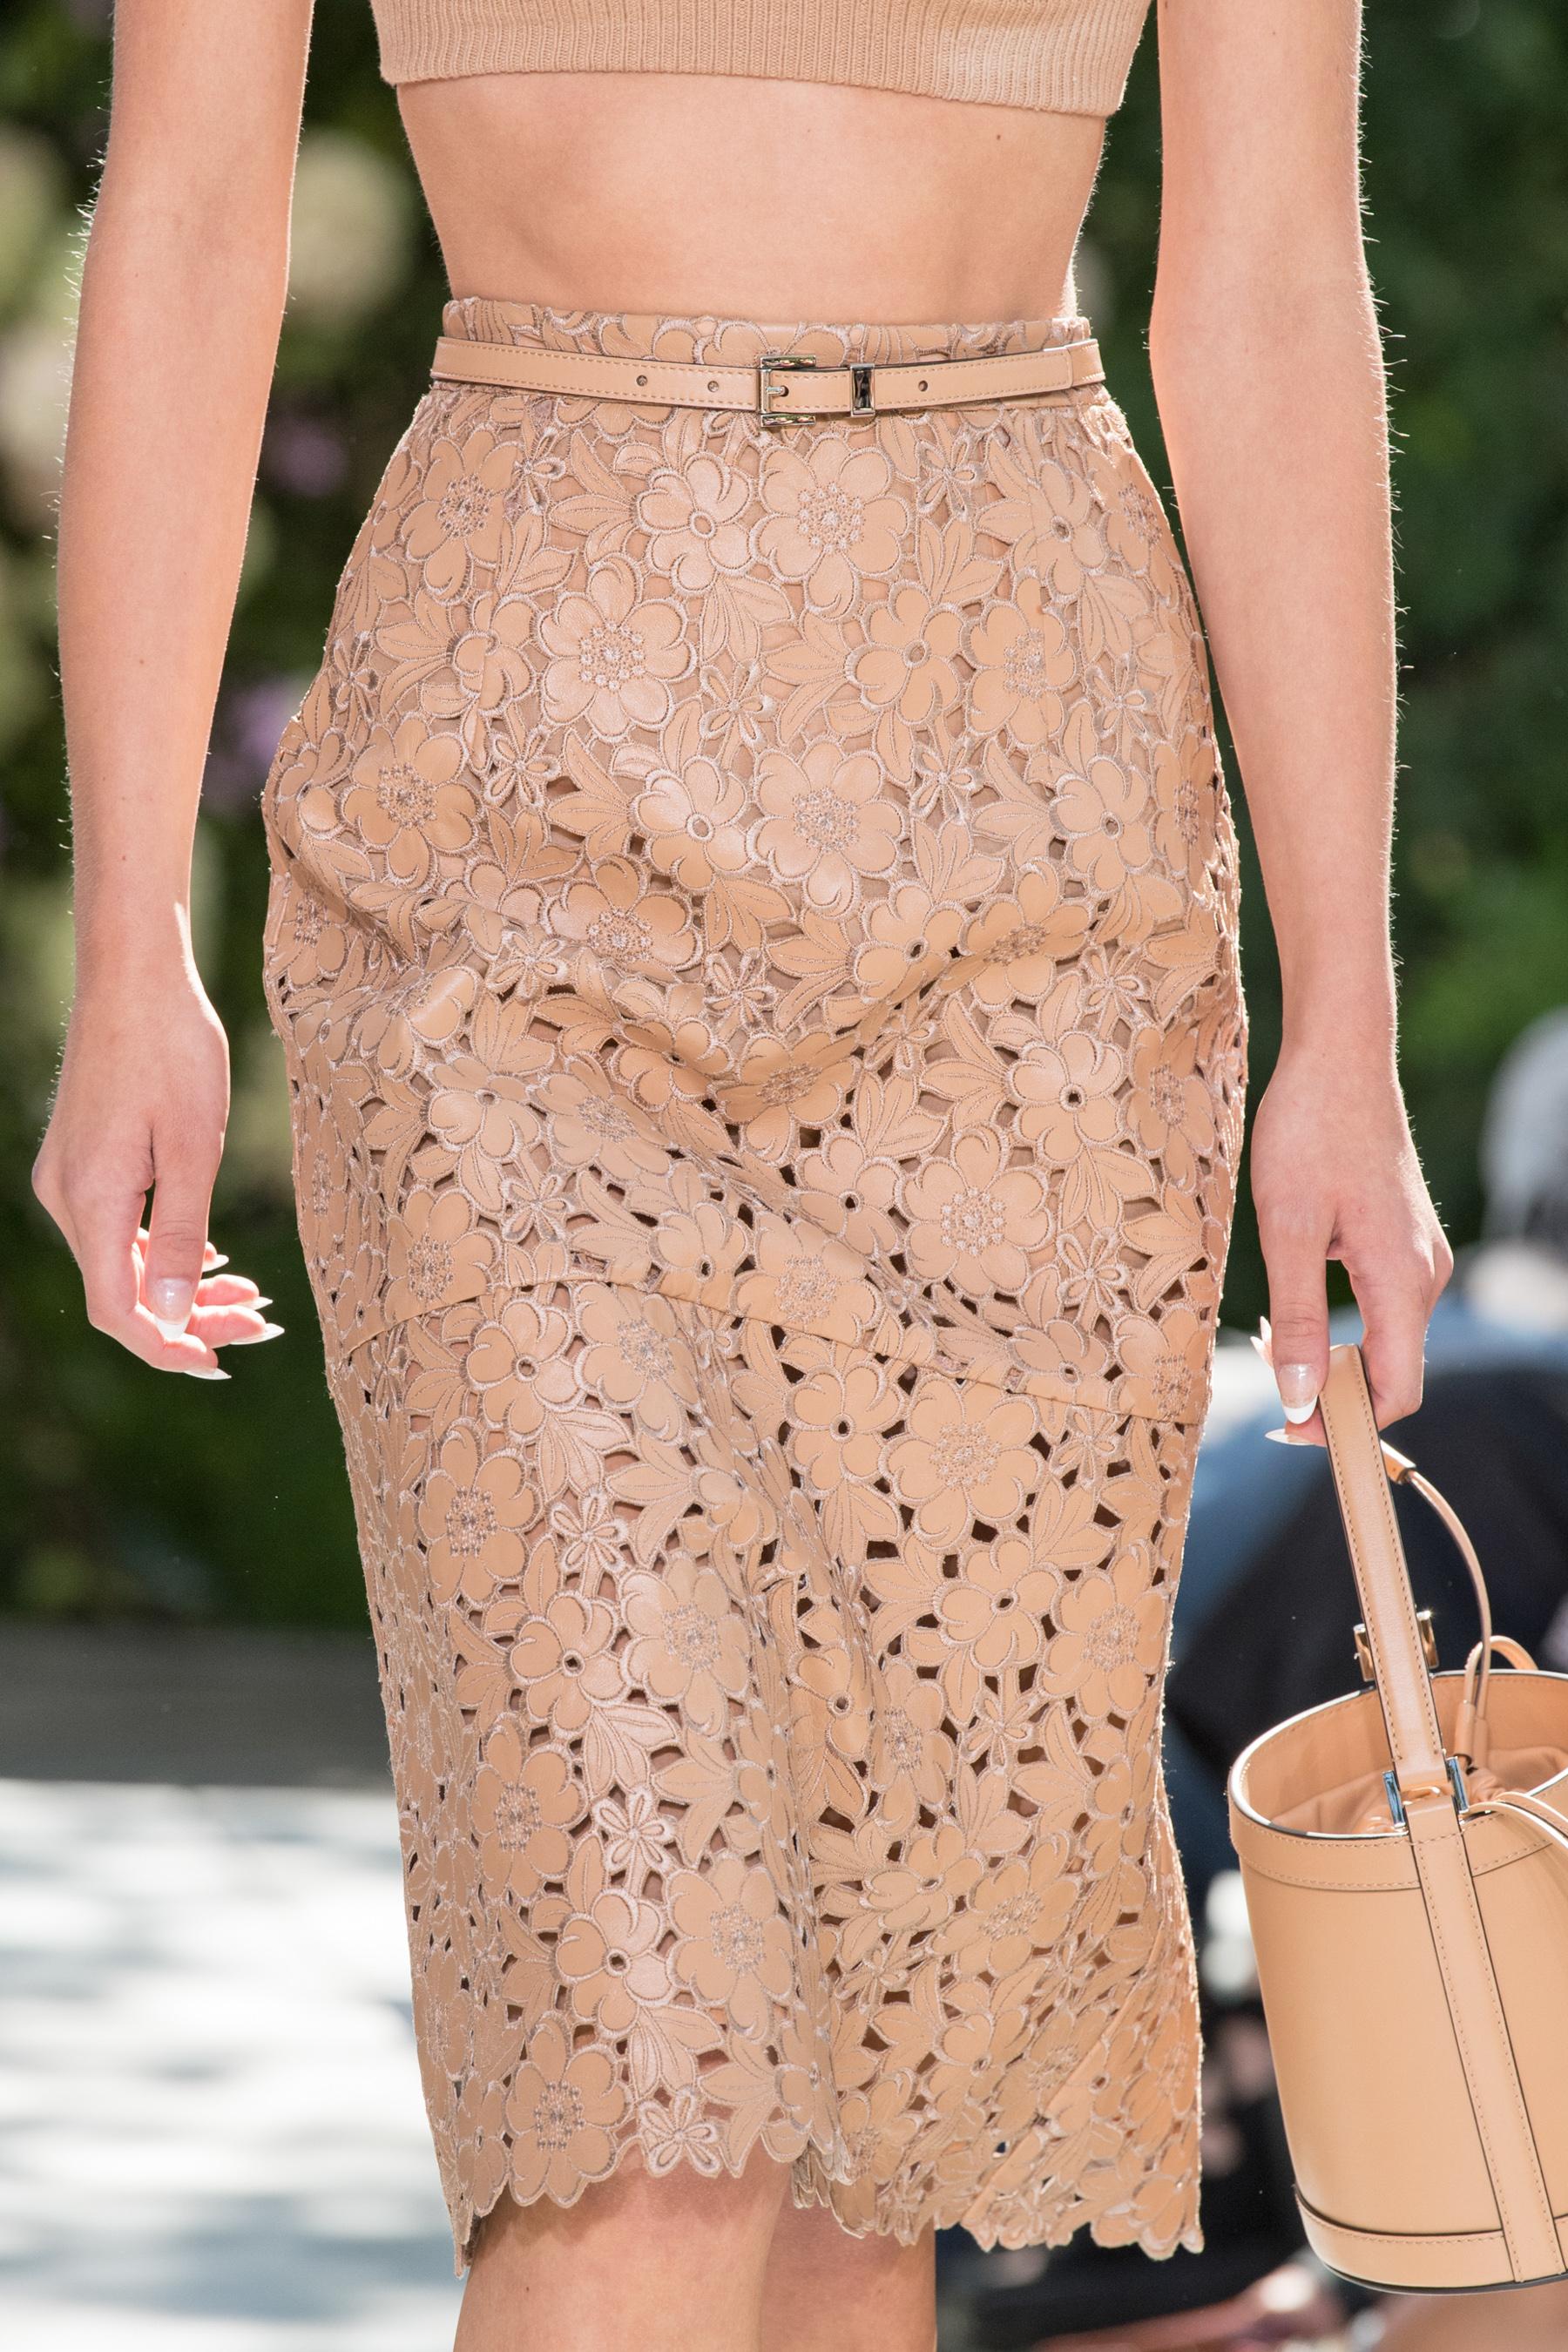 Michael Kors Spring 2022 Details Fashion Show